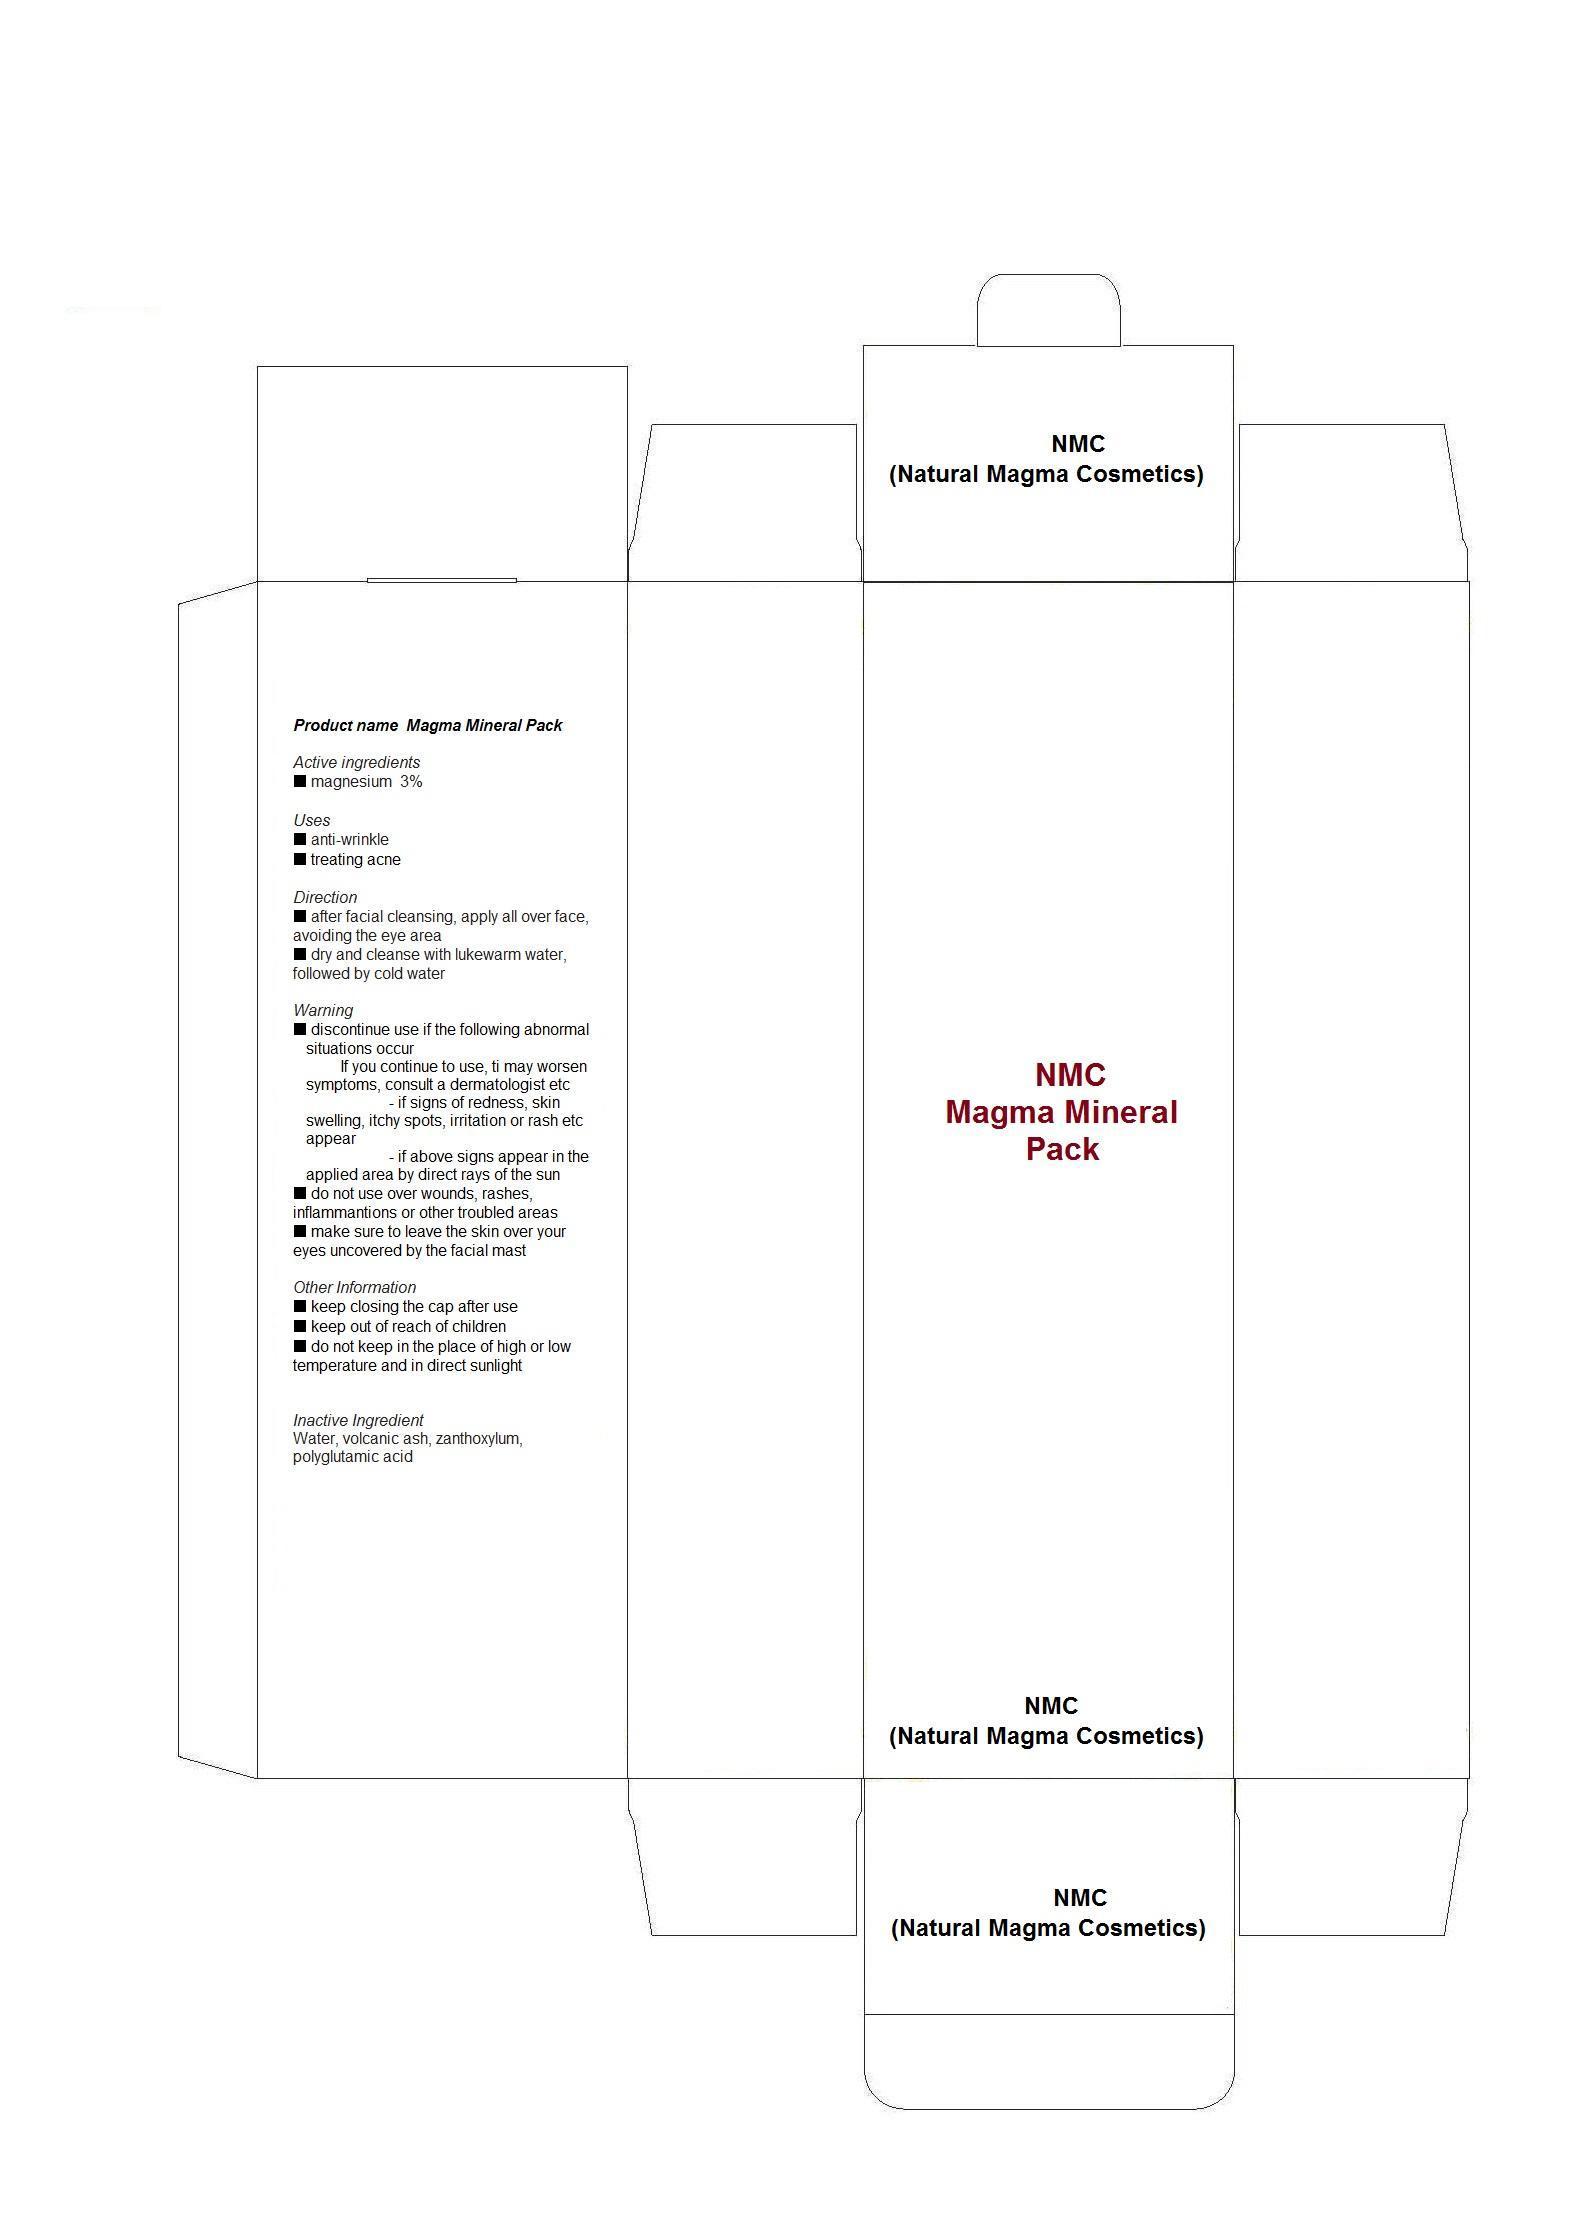 Nmc Magma Mineral Pack (Magnesium) Plaster [Nmc (Natural Magma Cosmetics)]